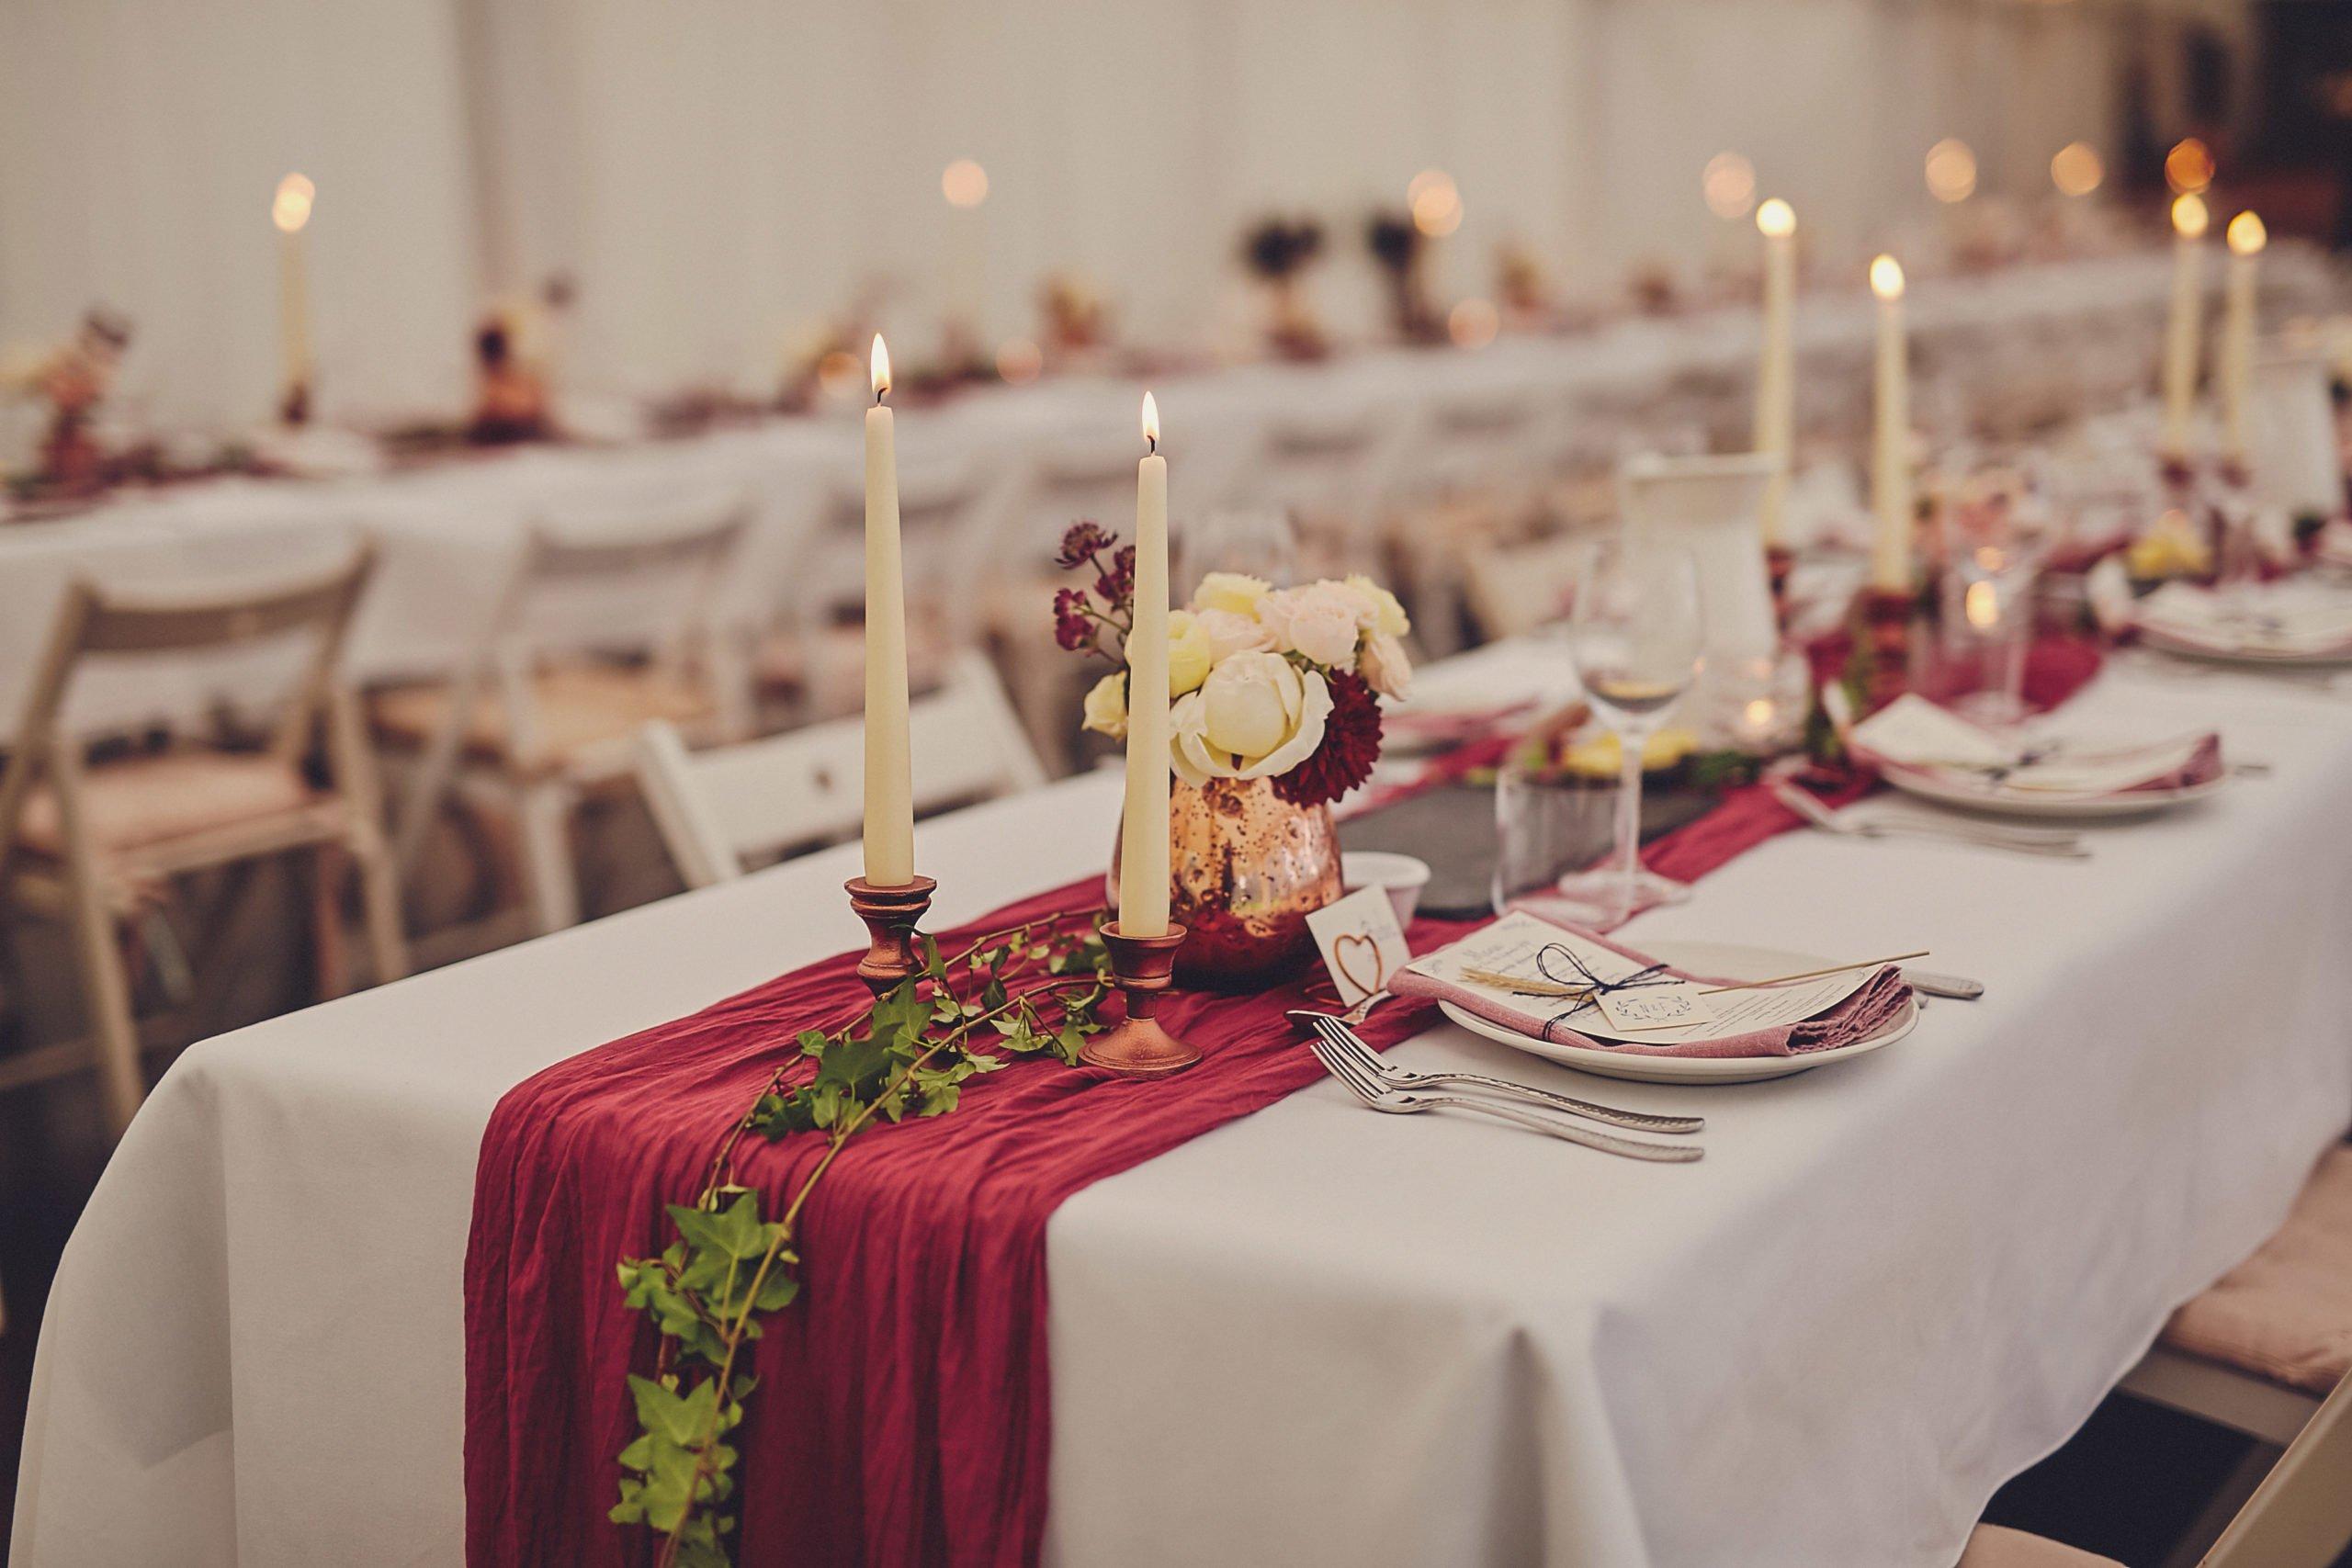 Cloughjordan House Wedding - Alternative Venue 9